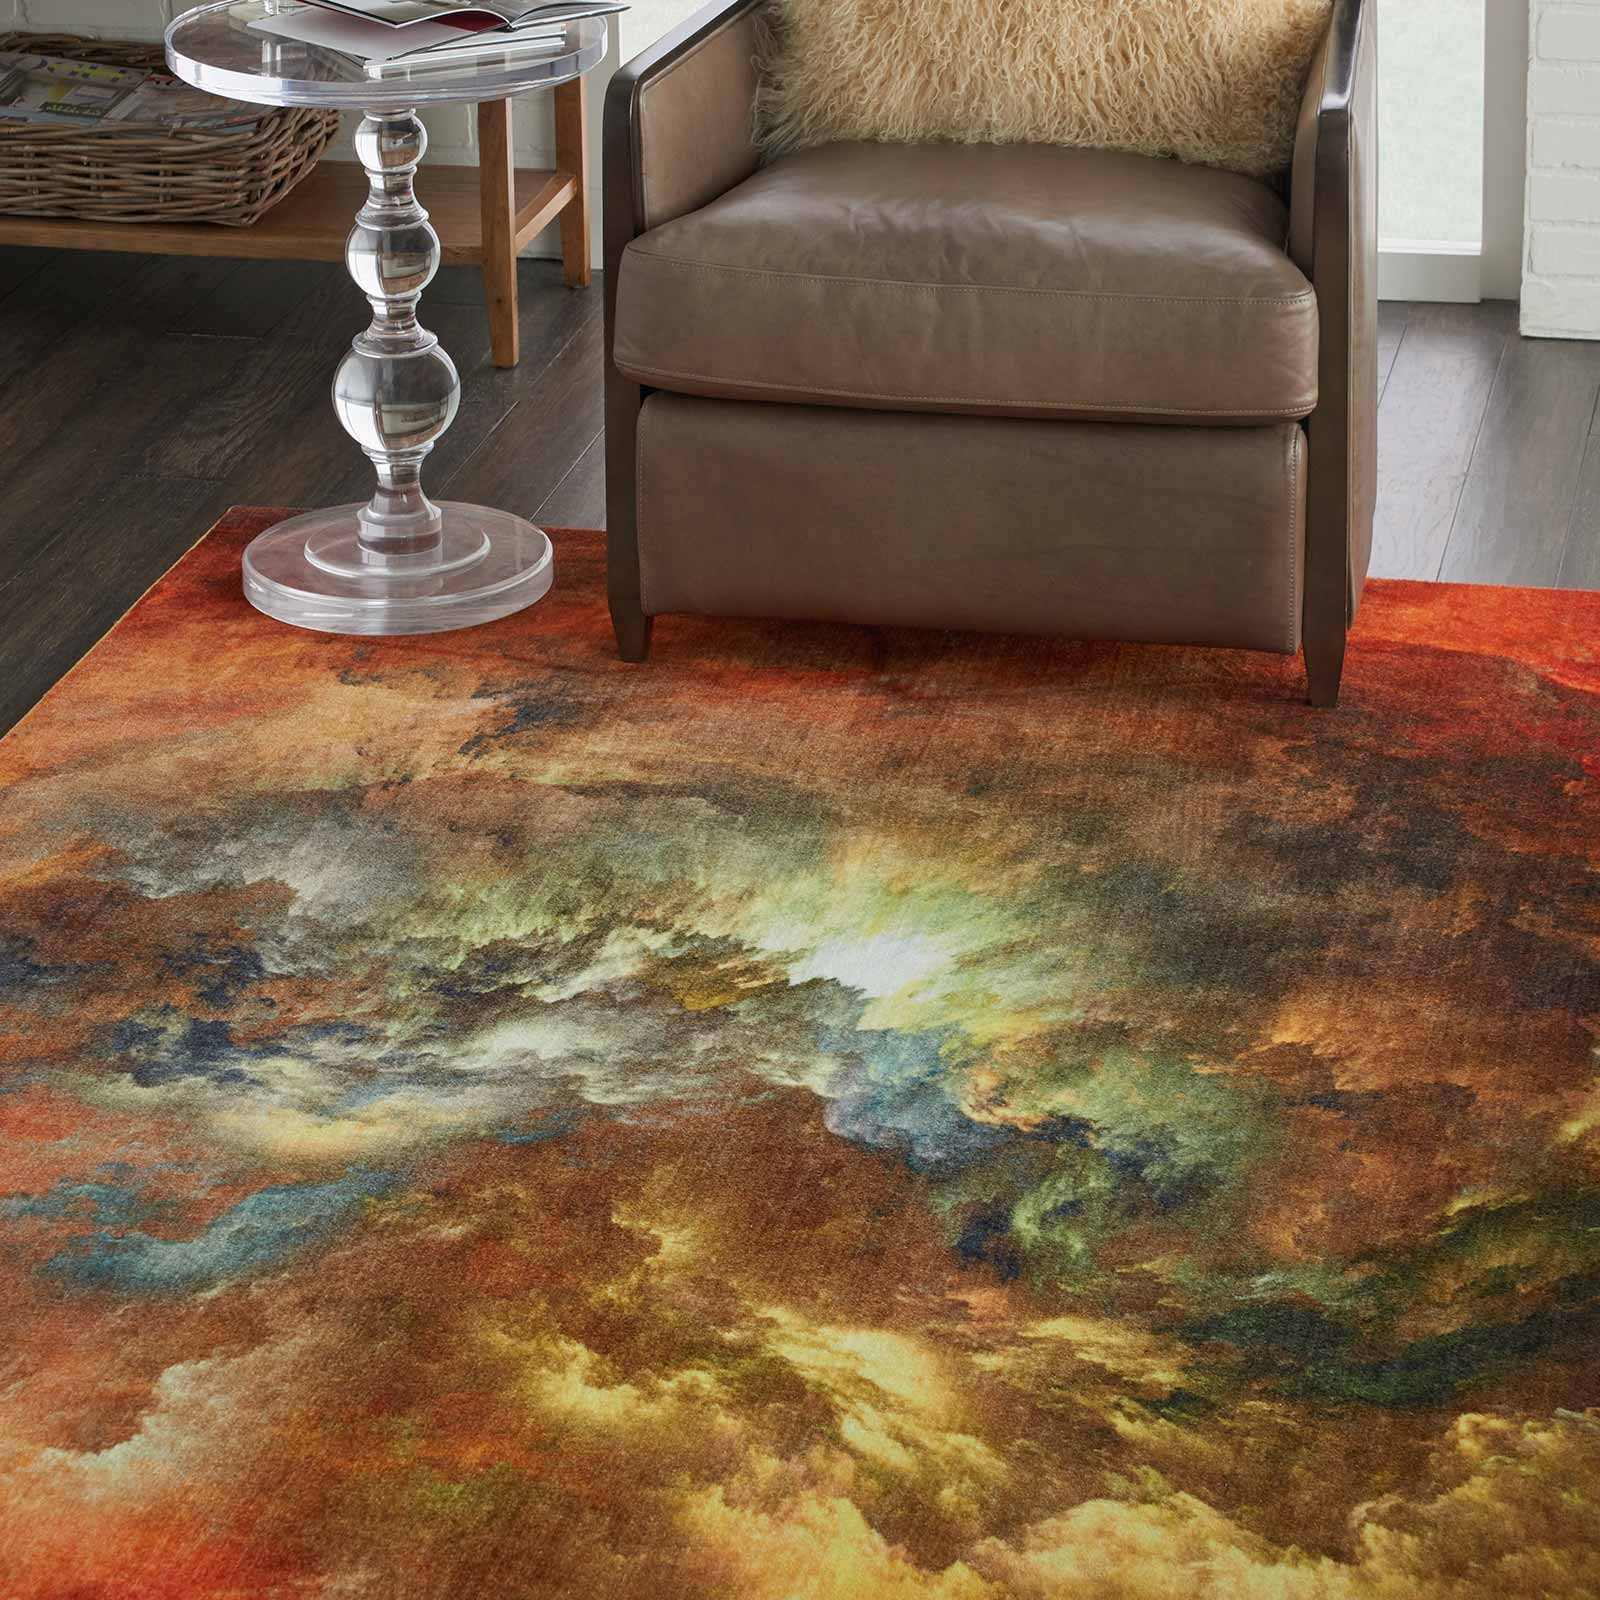 Nourison rug LREVE LER07 REDMT RED MULTICOLOR 8x10 099446494825 interior 2 C